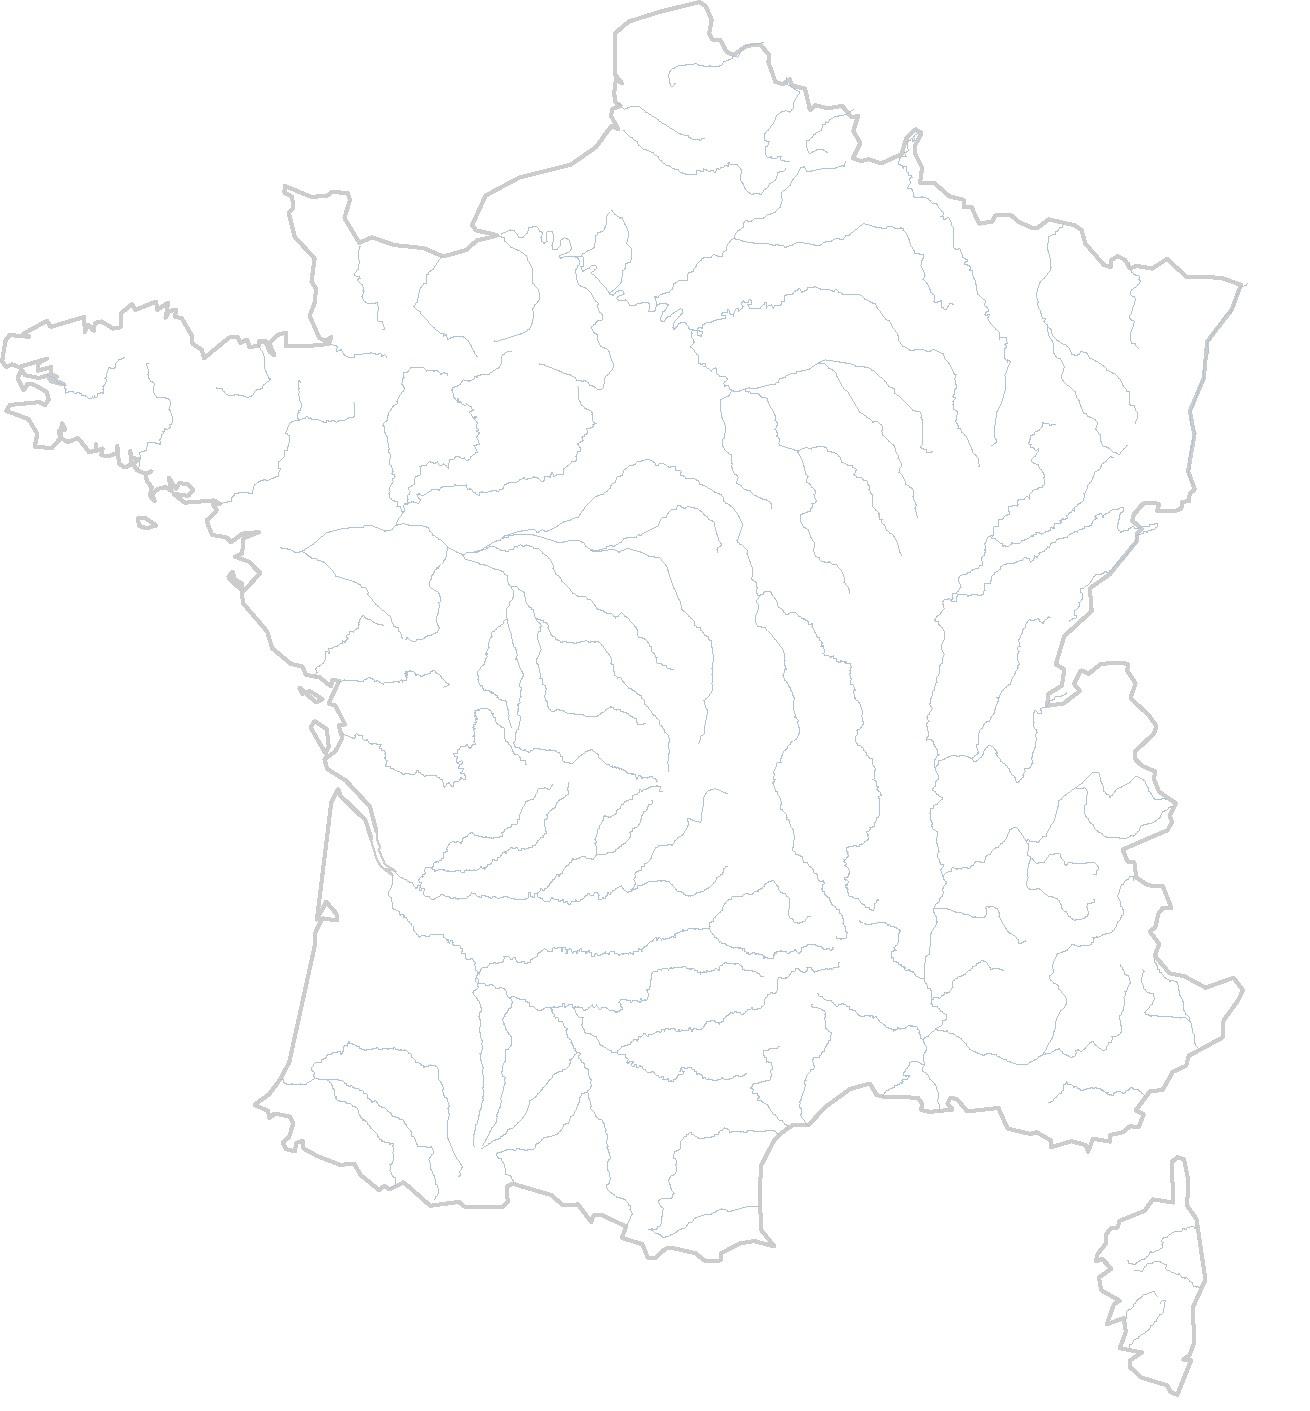 Cartes Muettes De La France À Imprimer - Chroniques dedans Carte Des Régions De France À Imprimer